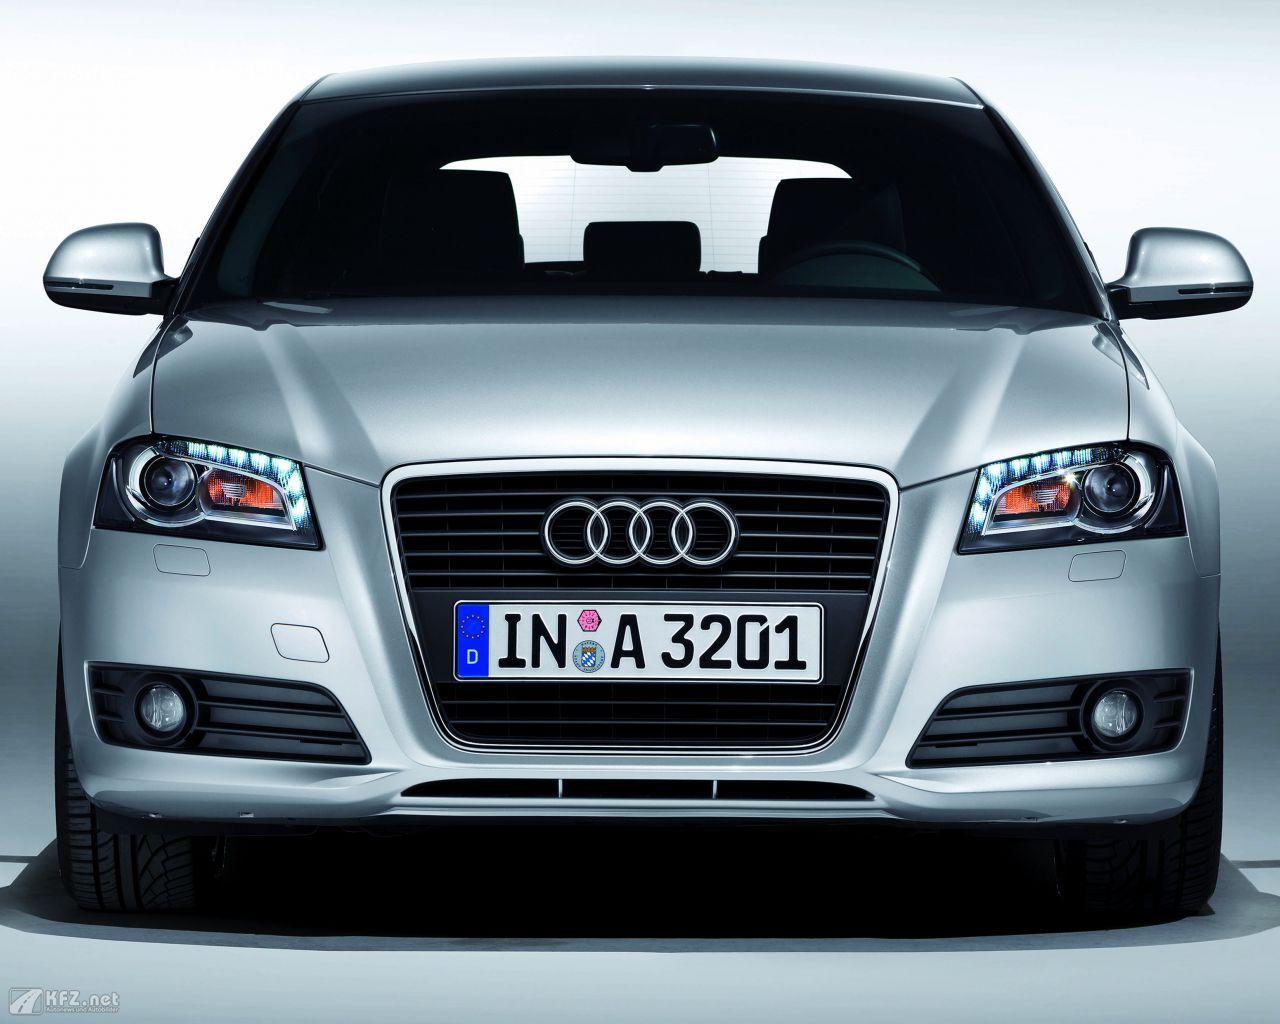 Audi A Bilder Audi A - Audi a3 lease los angeles